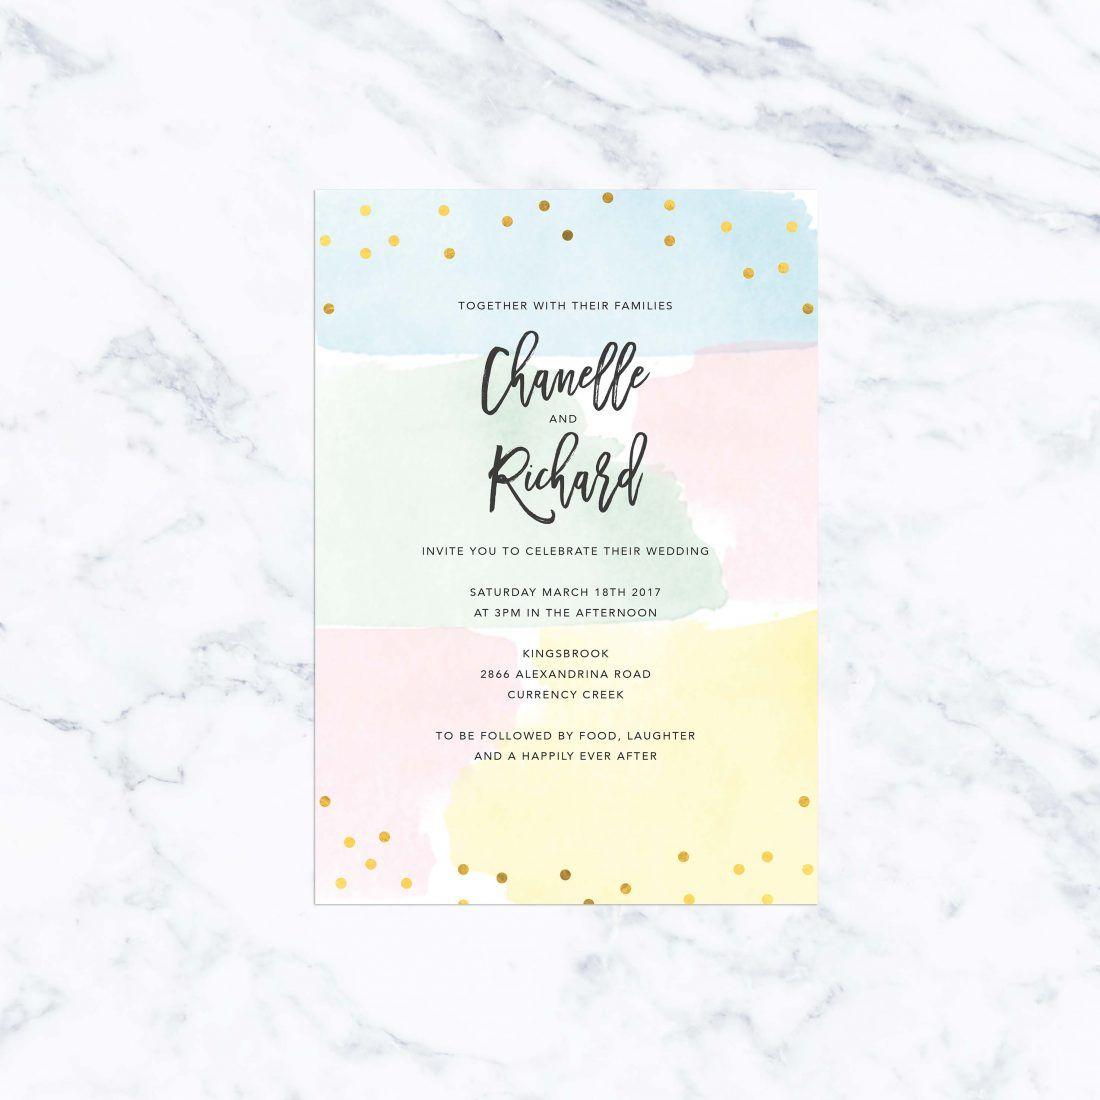 Foil Wedding Invitations | Wedding invitations australia and Weddings